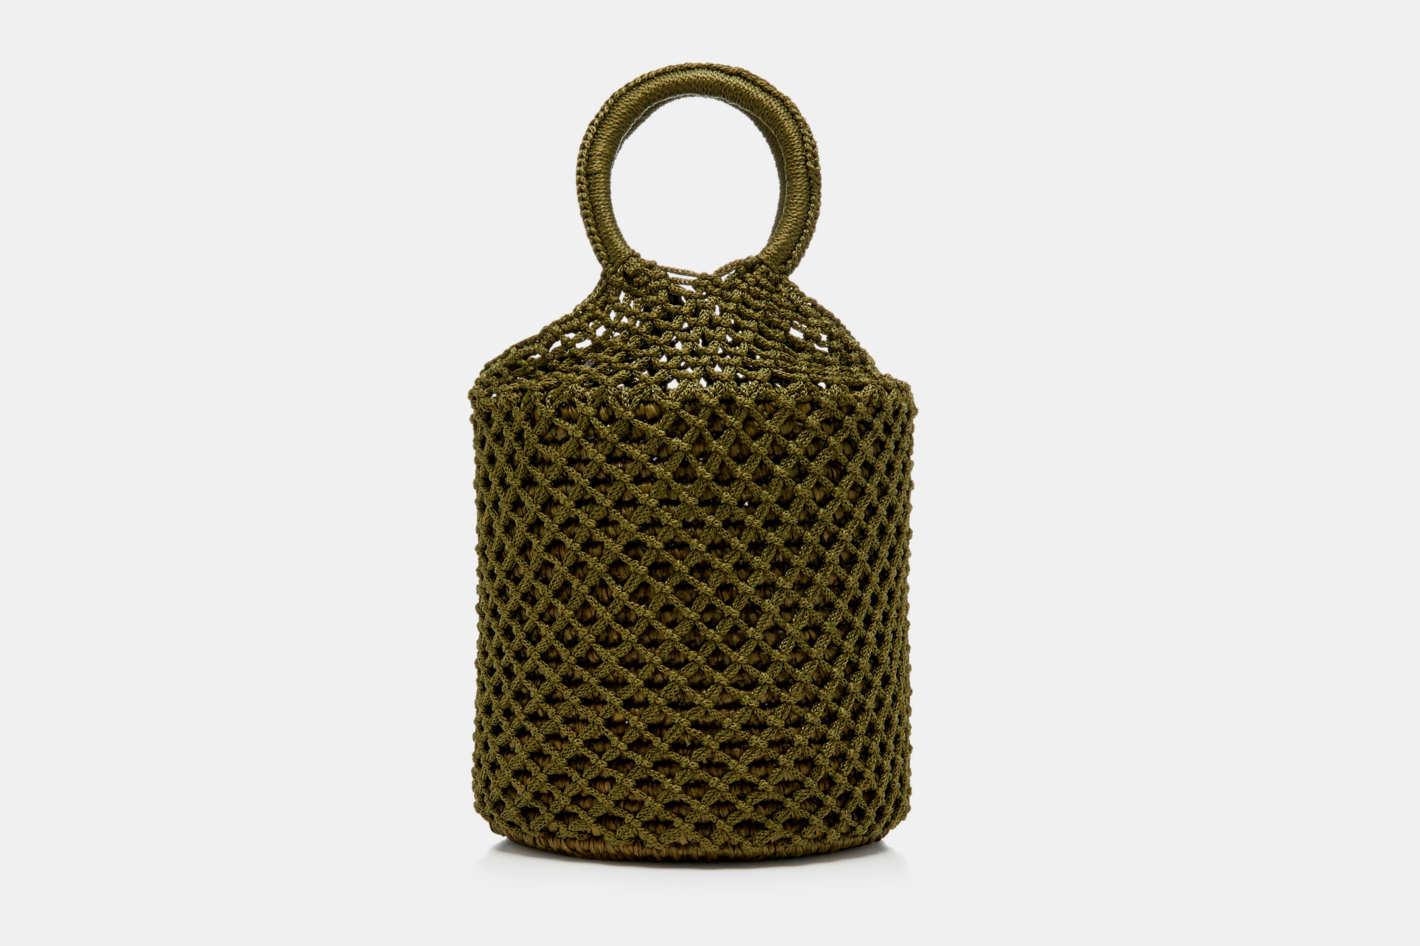 Sensi Studio M'O Exclusive Netted Straw Tote Bag